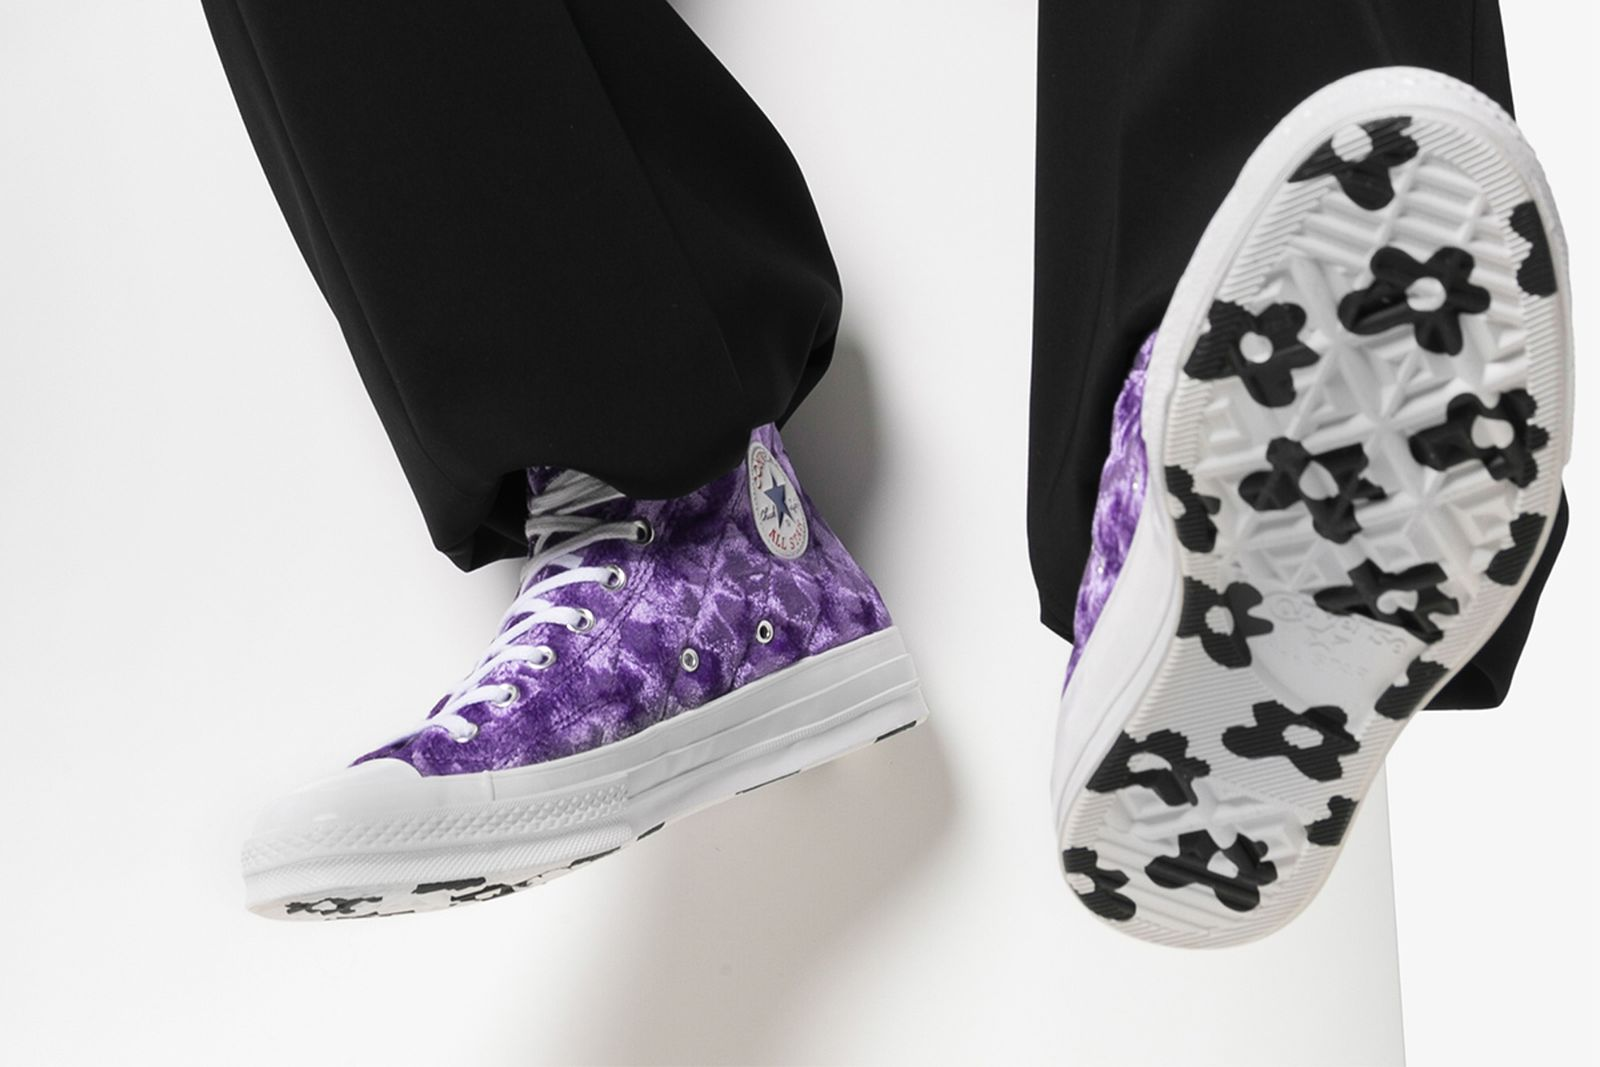 farfetch sneaker week top drops to cop Ambush x Nike Converse GOLF Le FLEUR* Maison Margiela